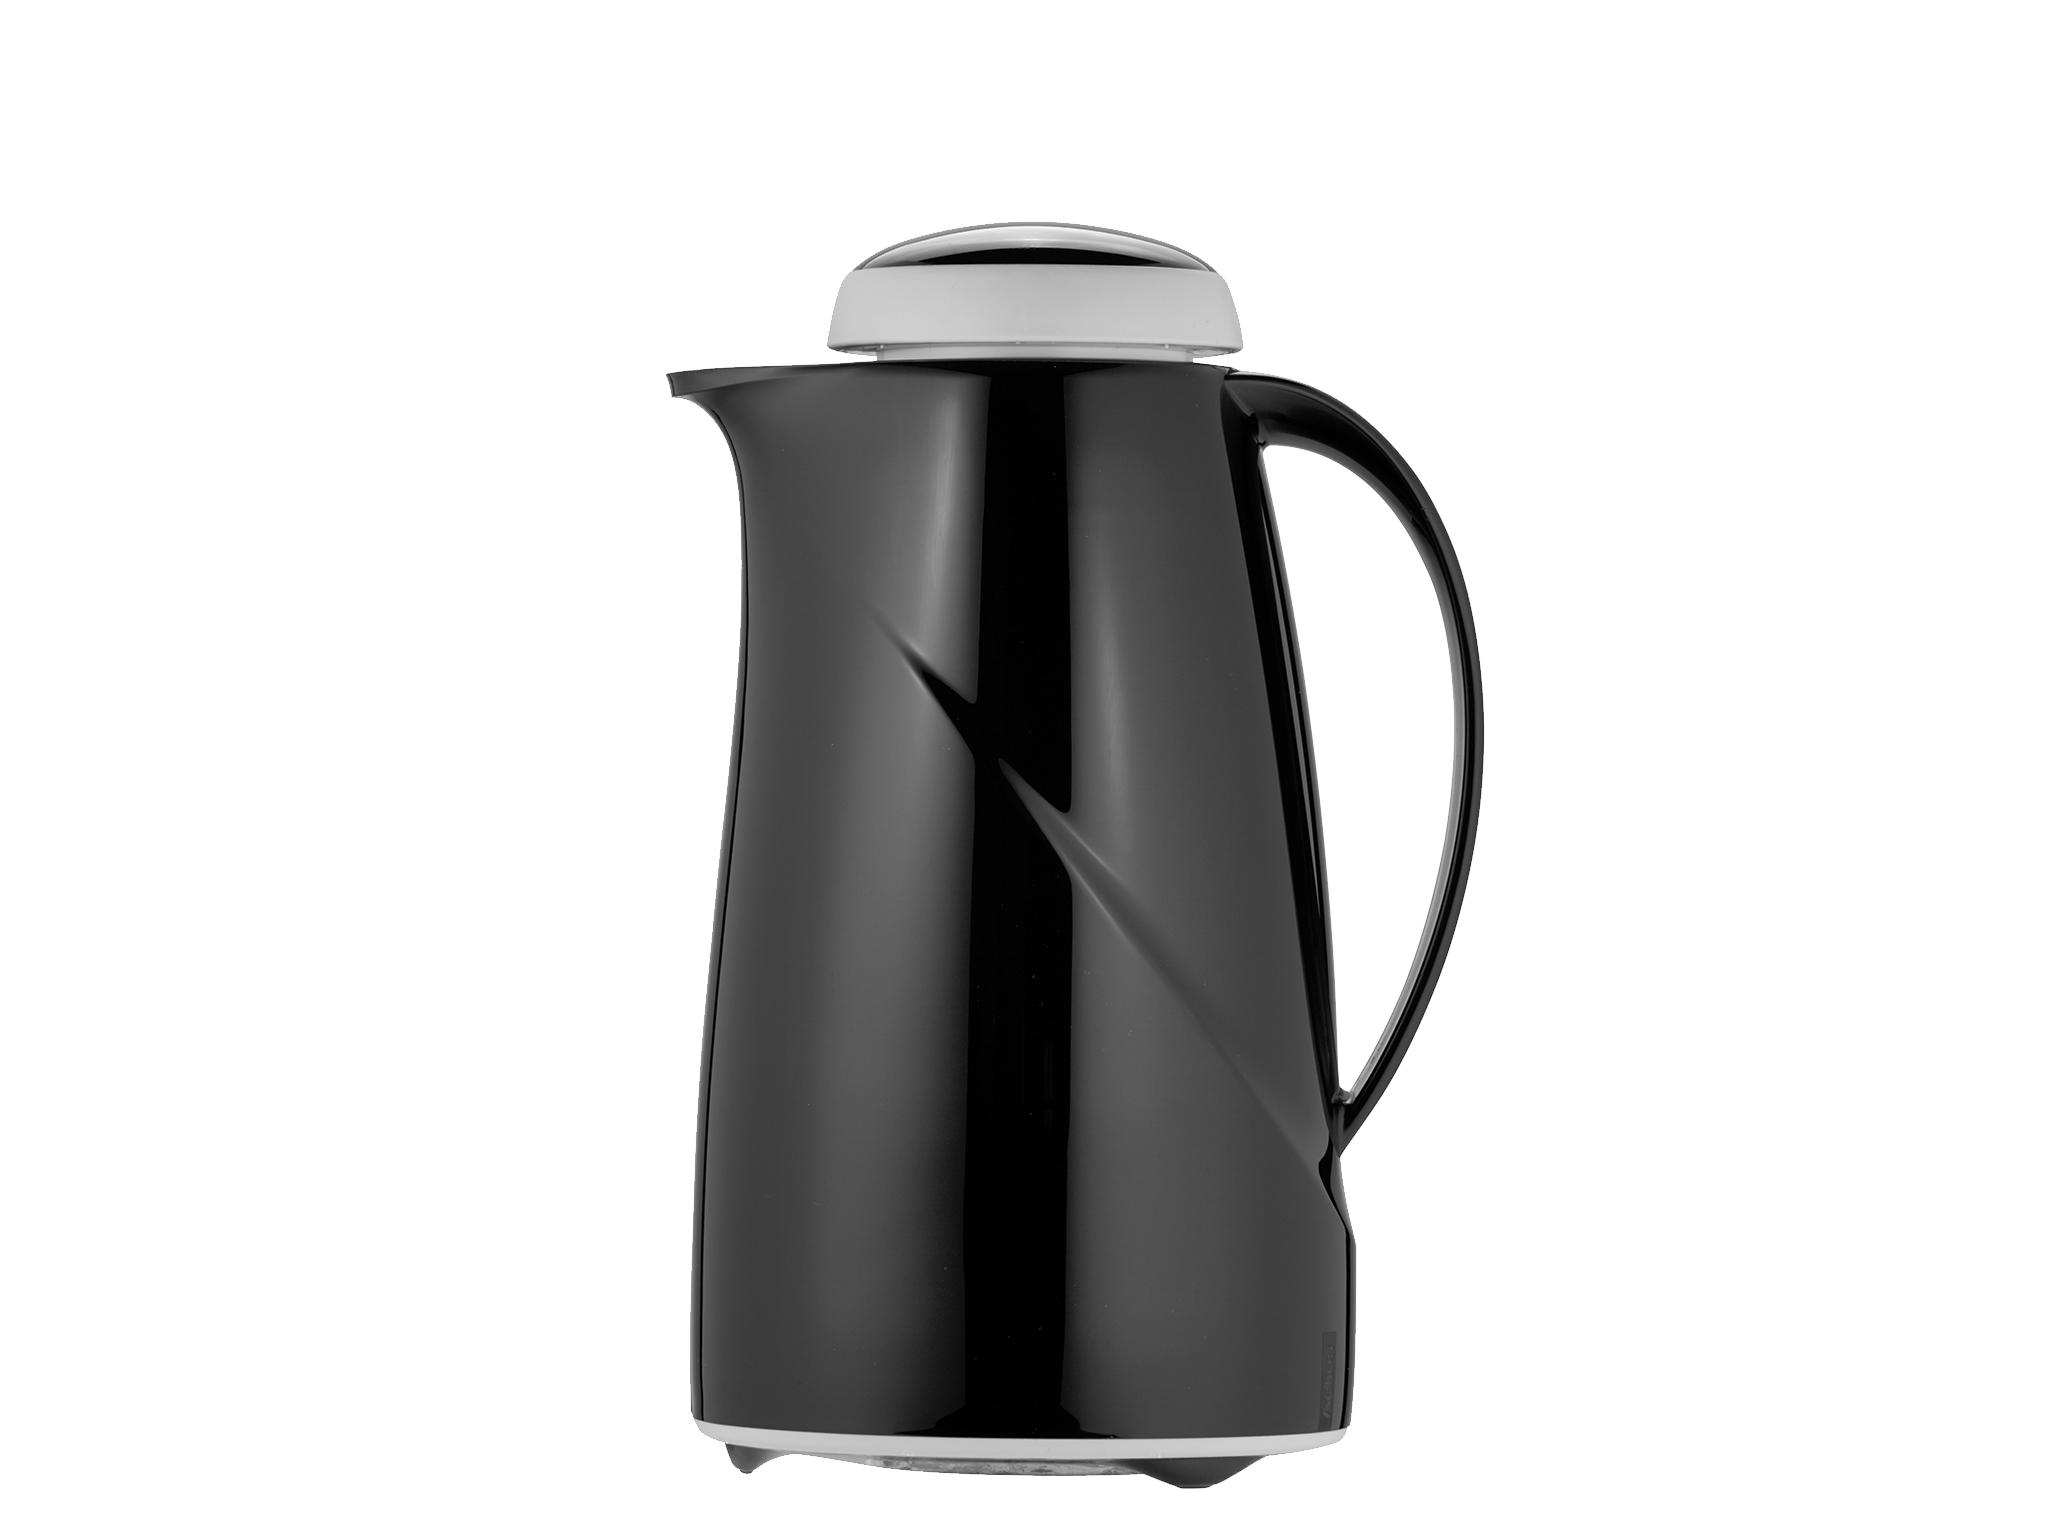 2964-002 - Vacuum carafe unbreakable black 1.0 L WAVE S+ - Helios